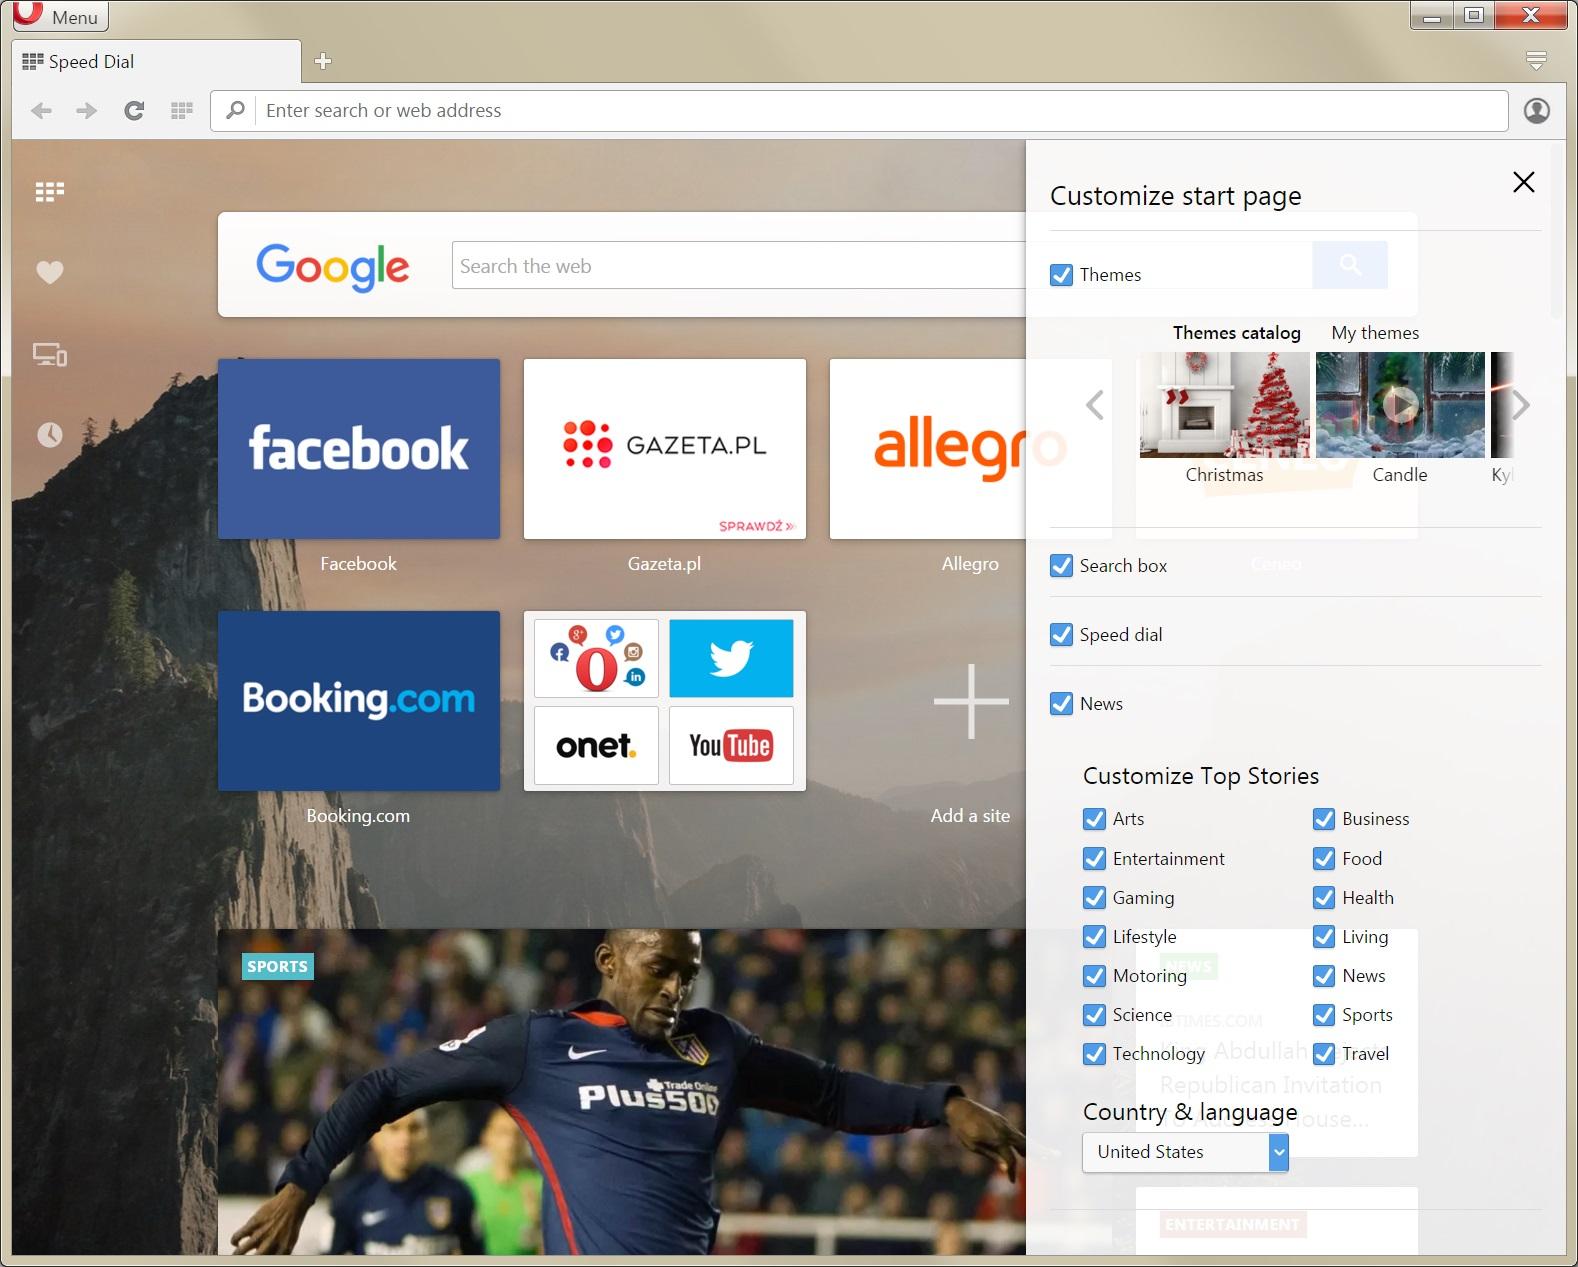 Merged startpage with customization